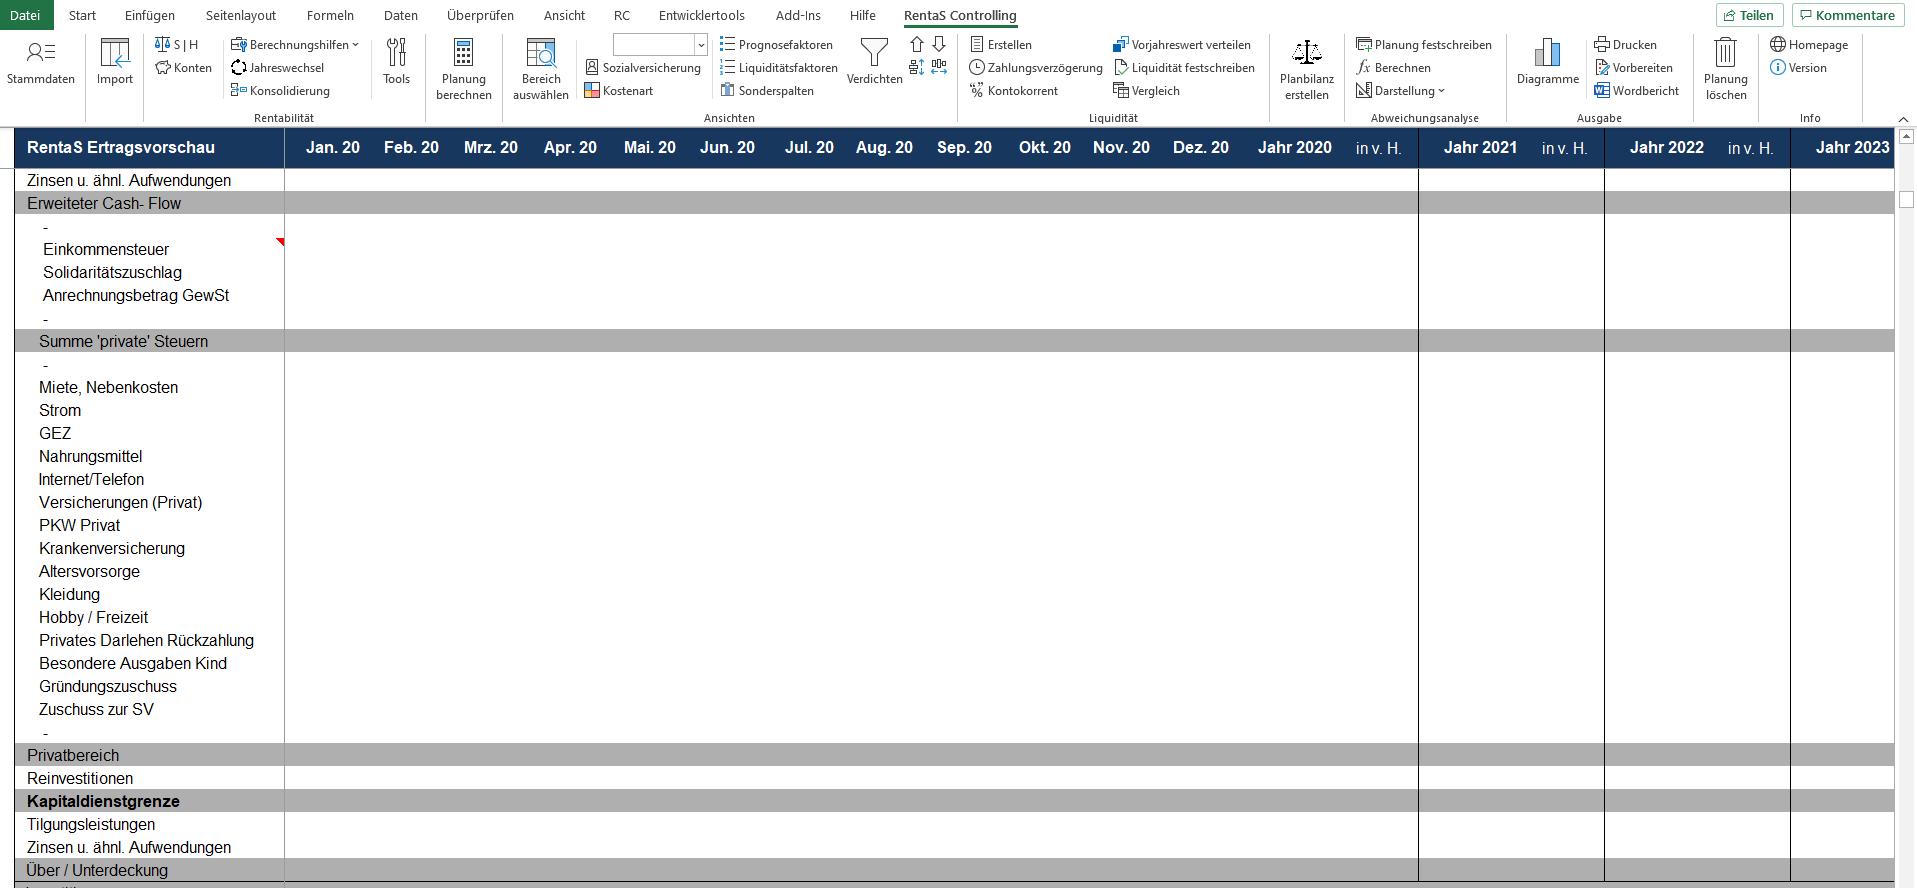 Rentabilitätsplanung_Privatbereich_RentaS_Controllingsoftware